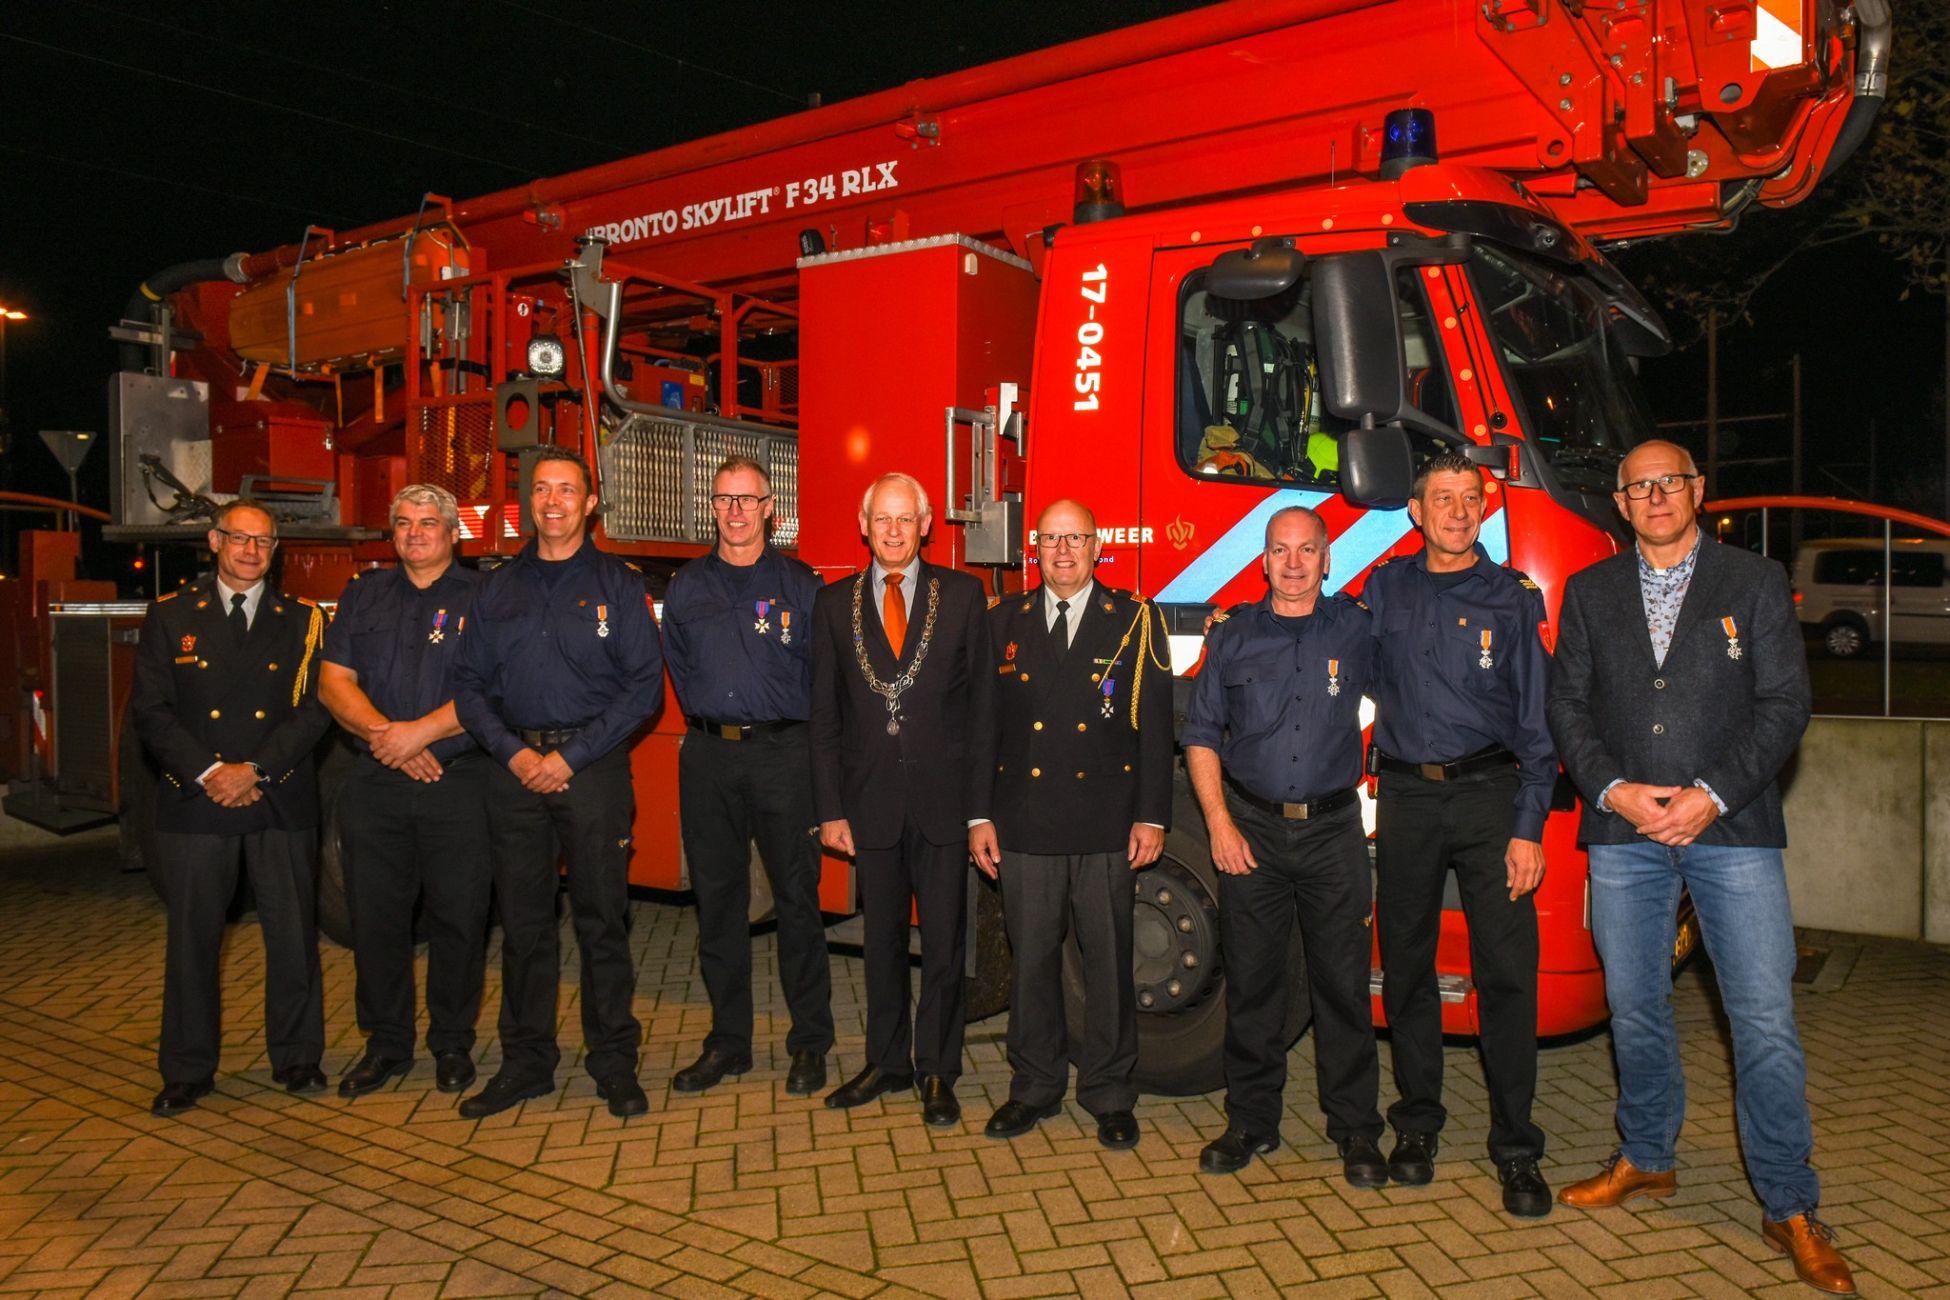 Brandweermannen onderscheiden